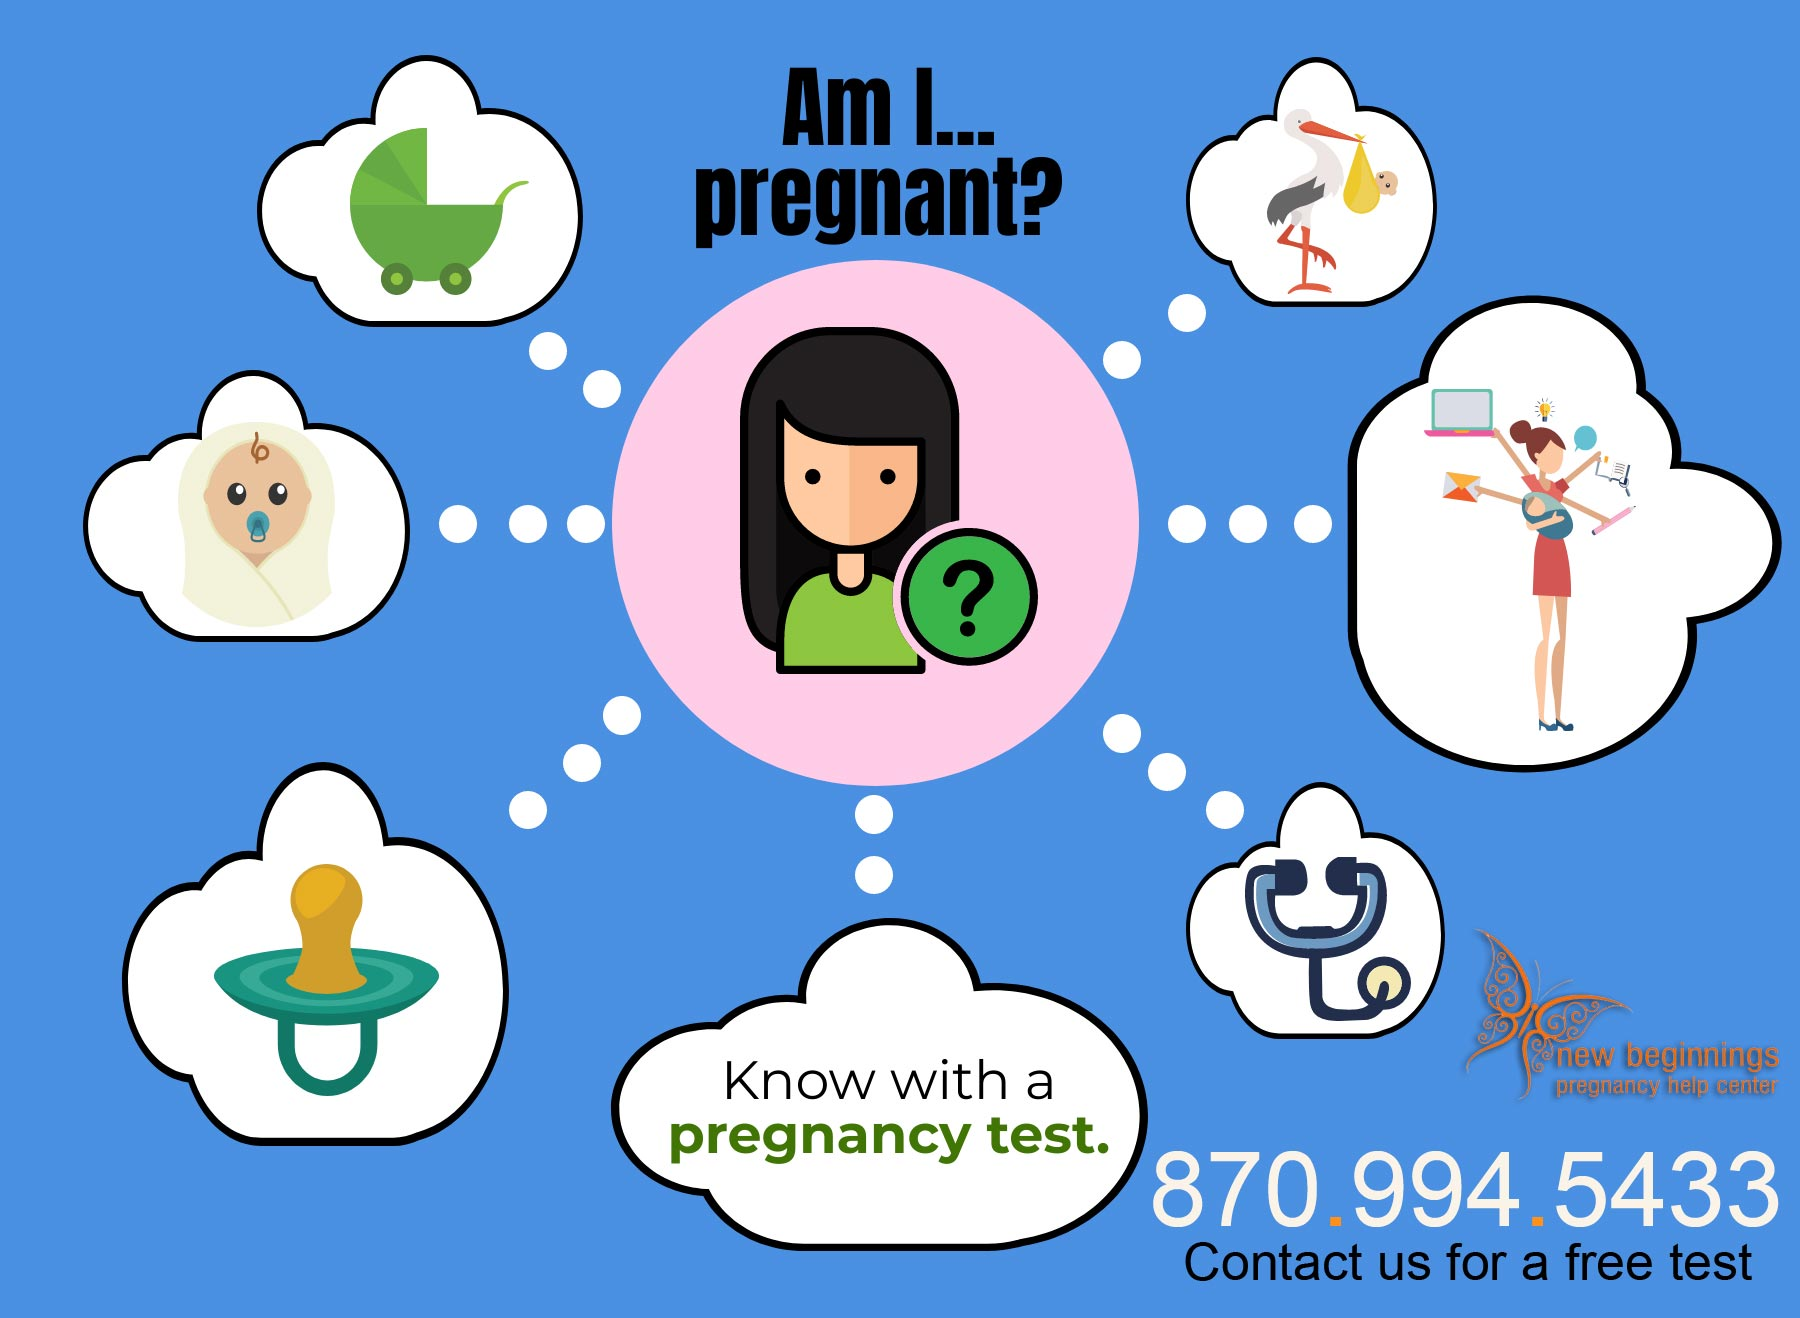 pregnancy test image 2